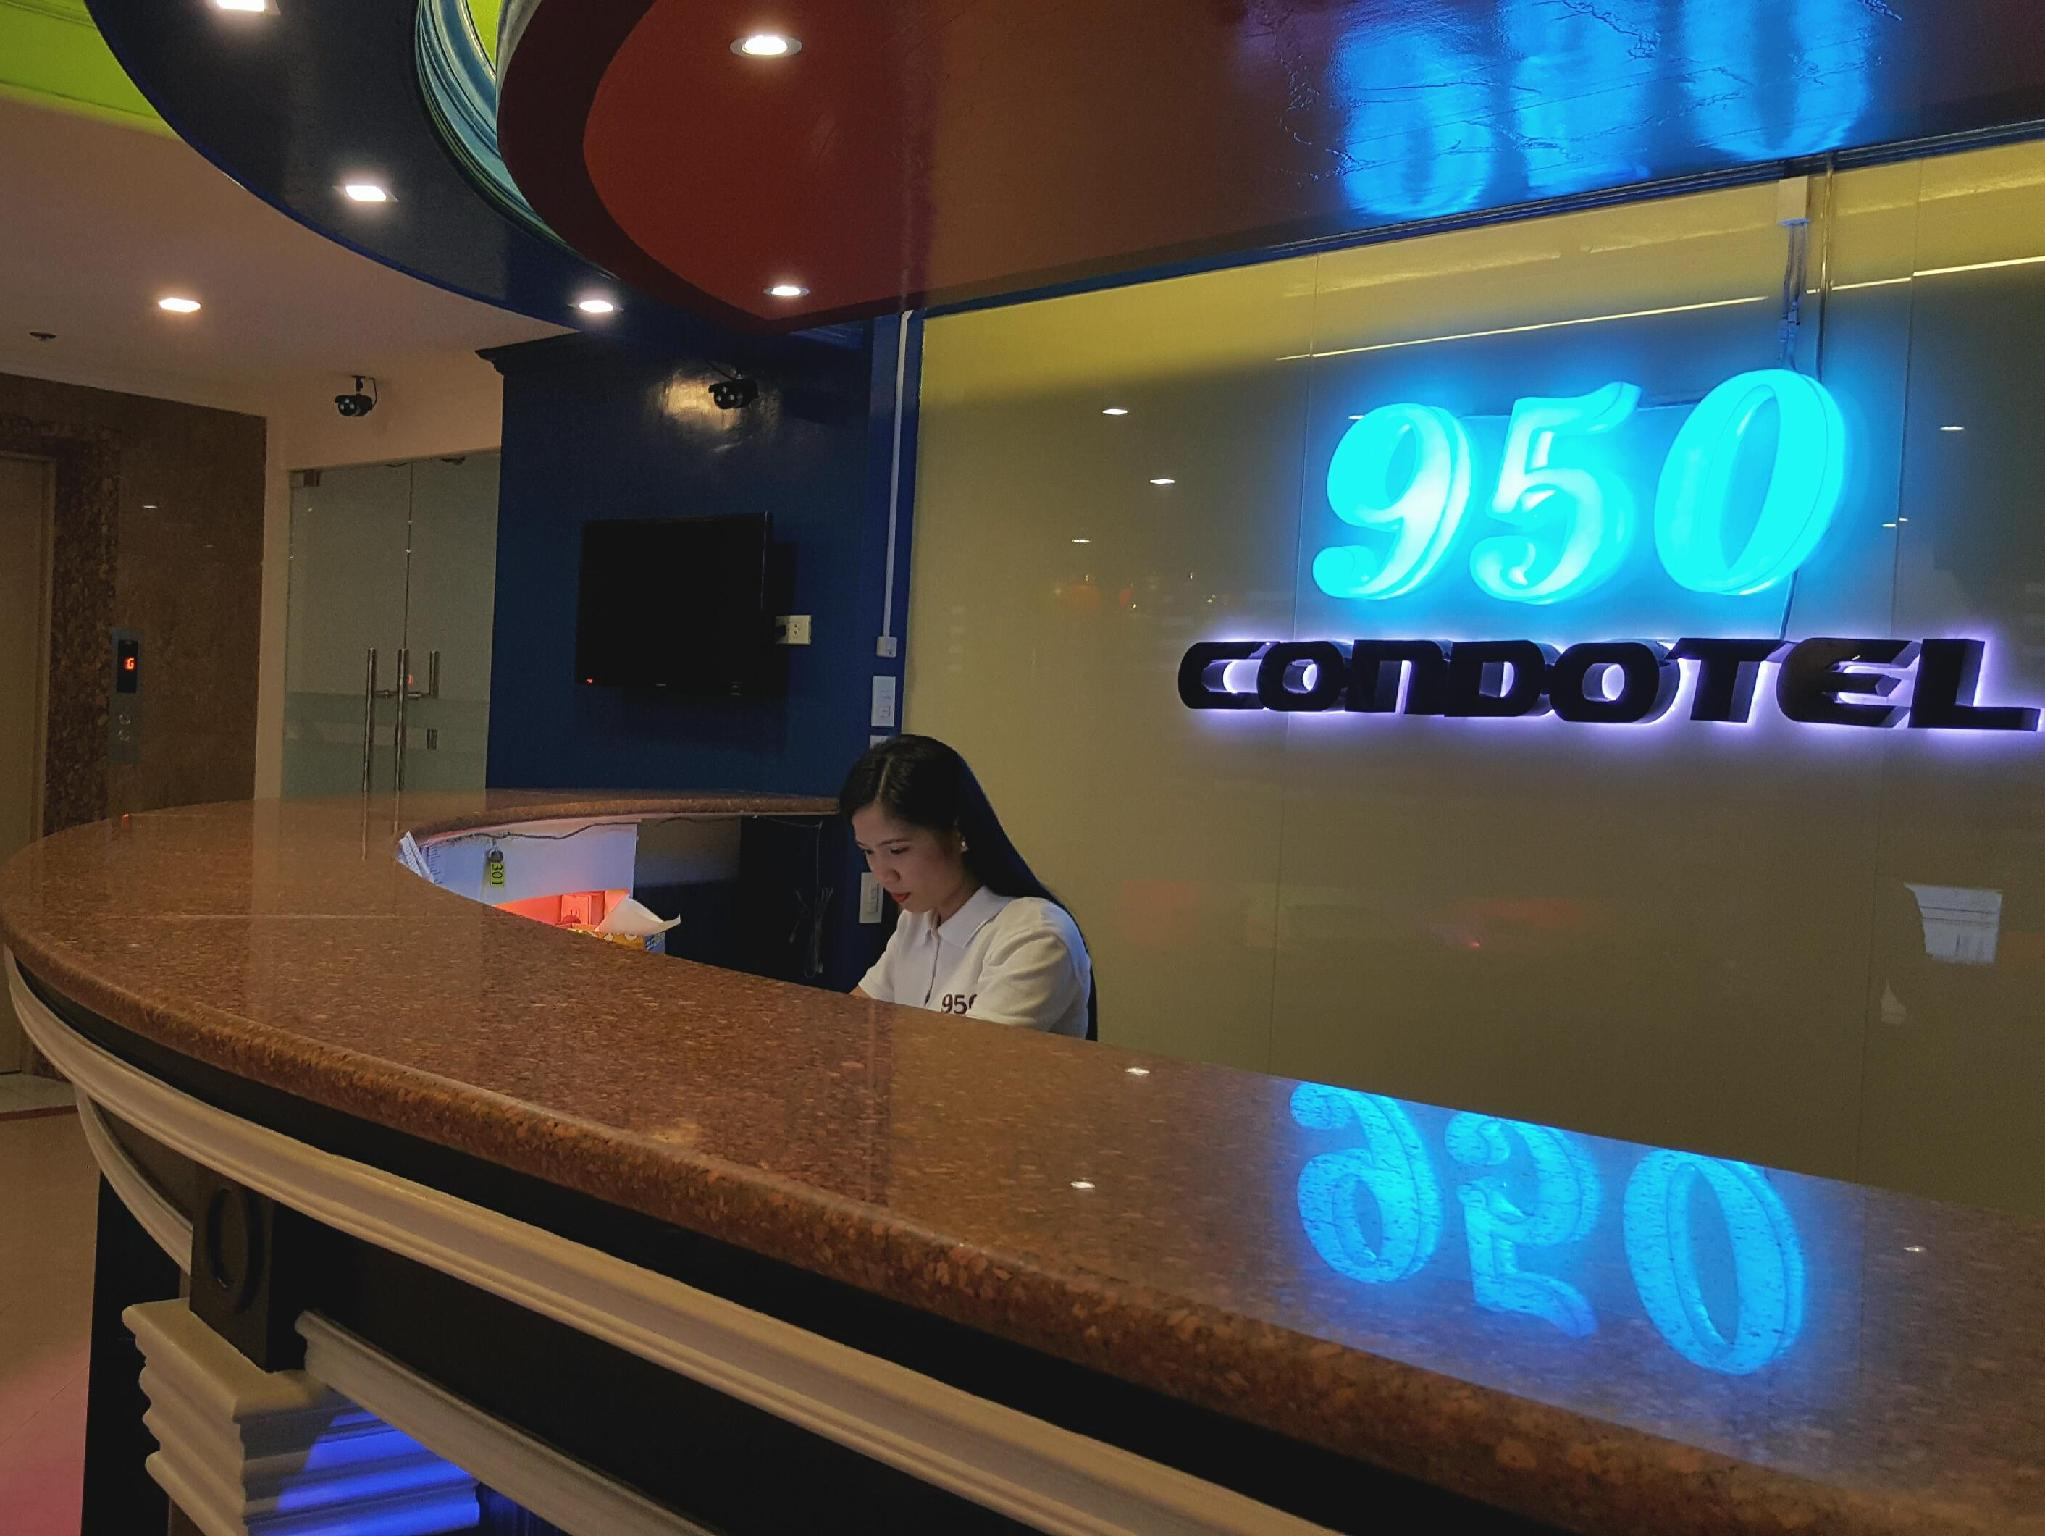 950 Condotel